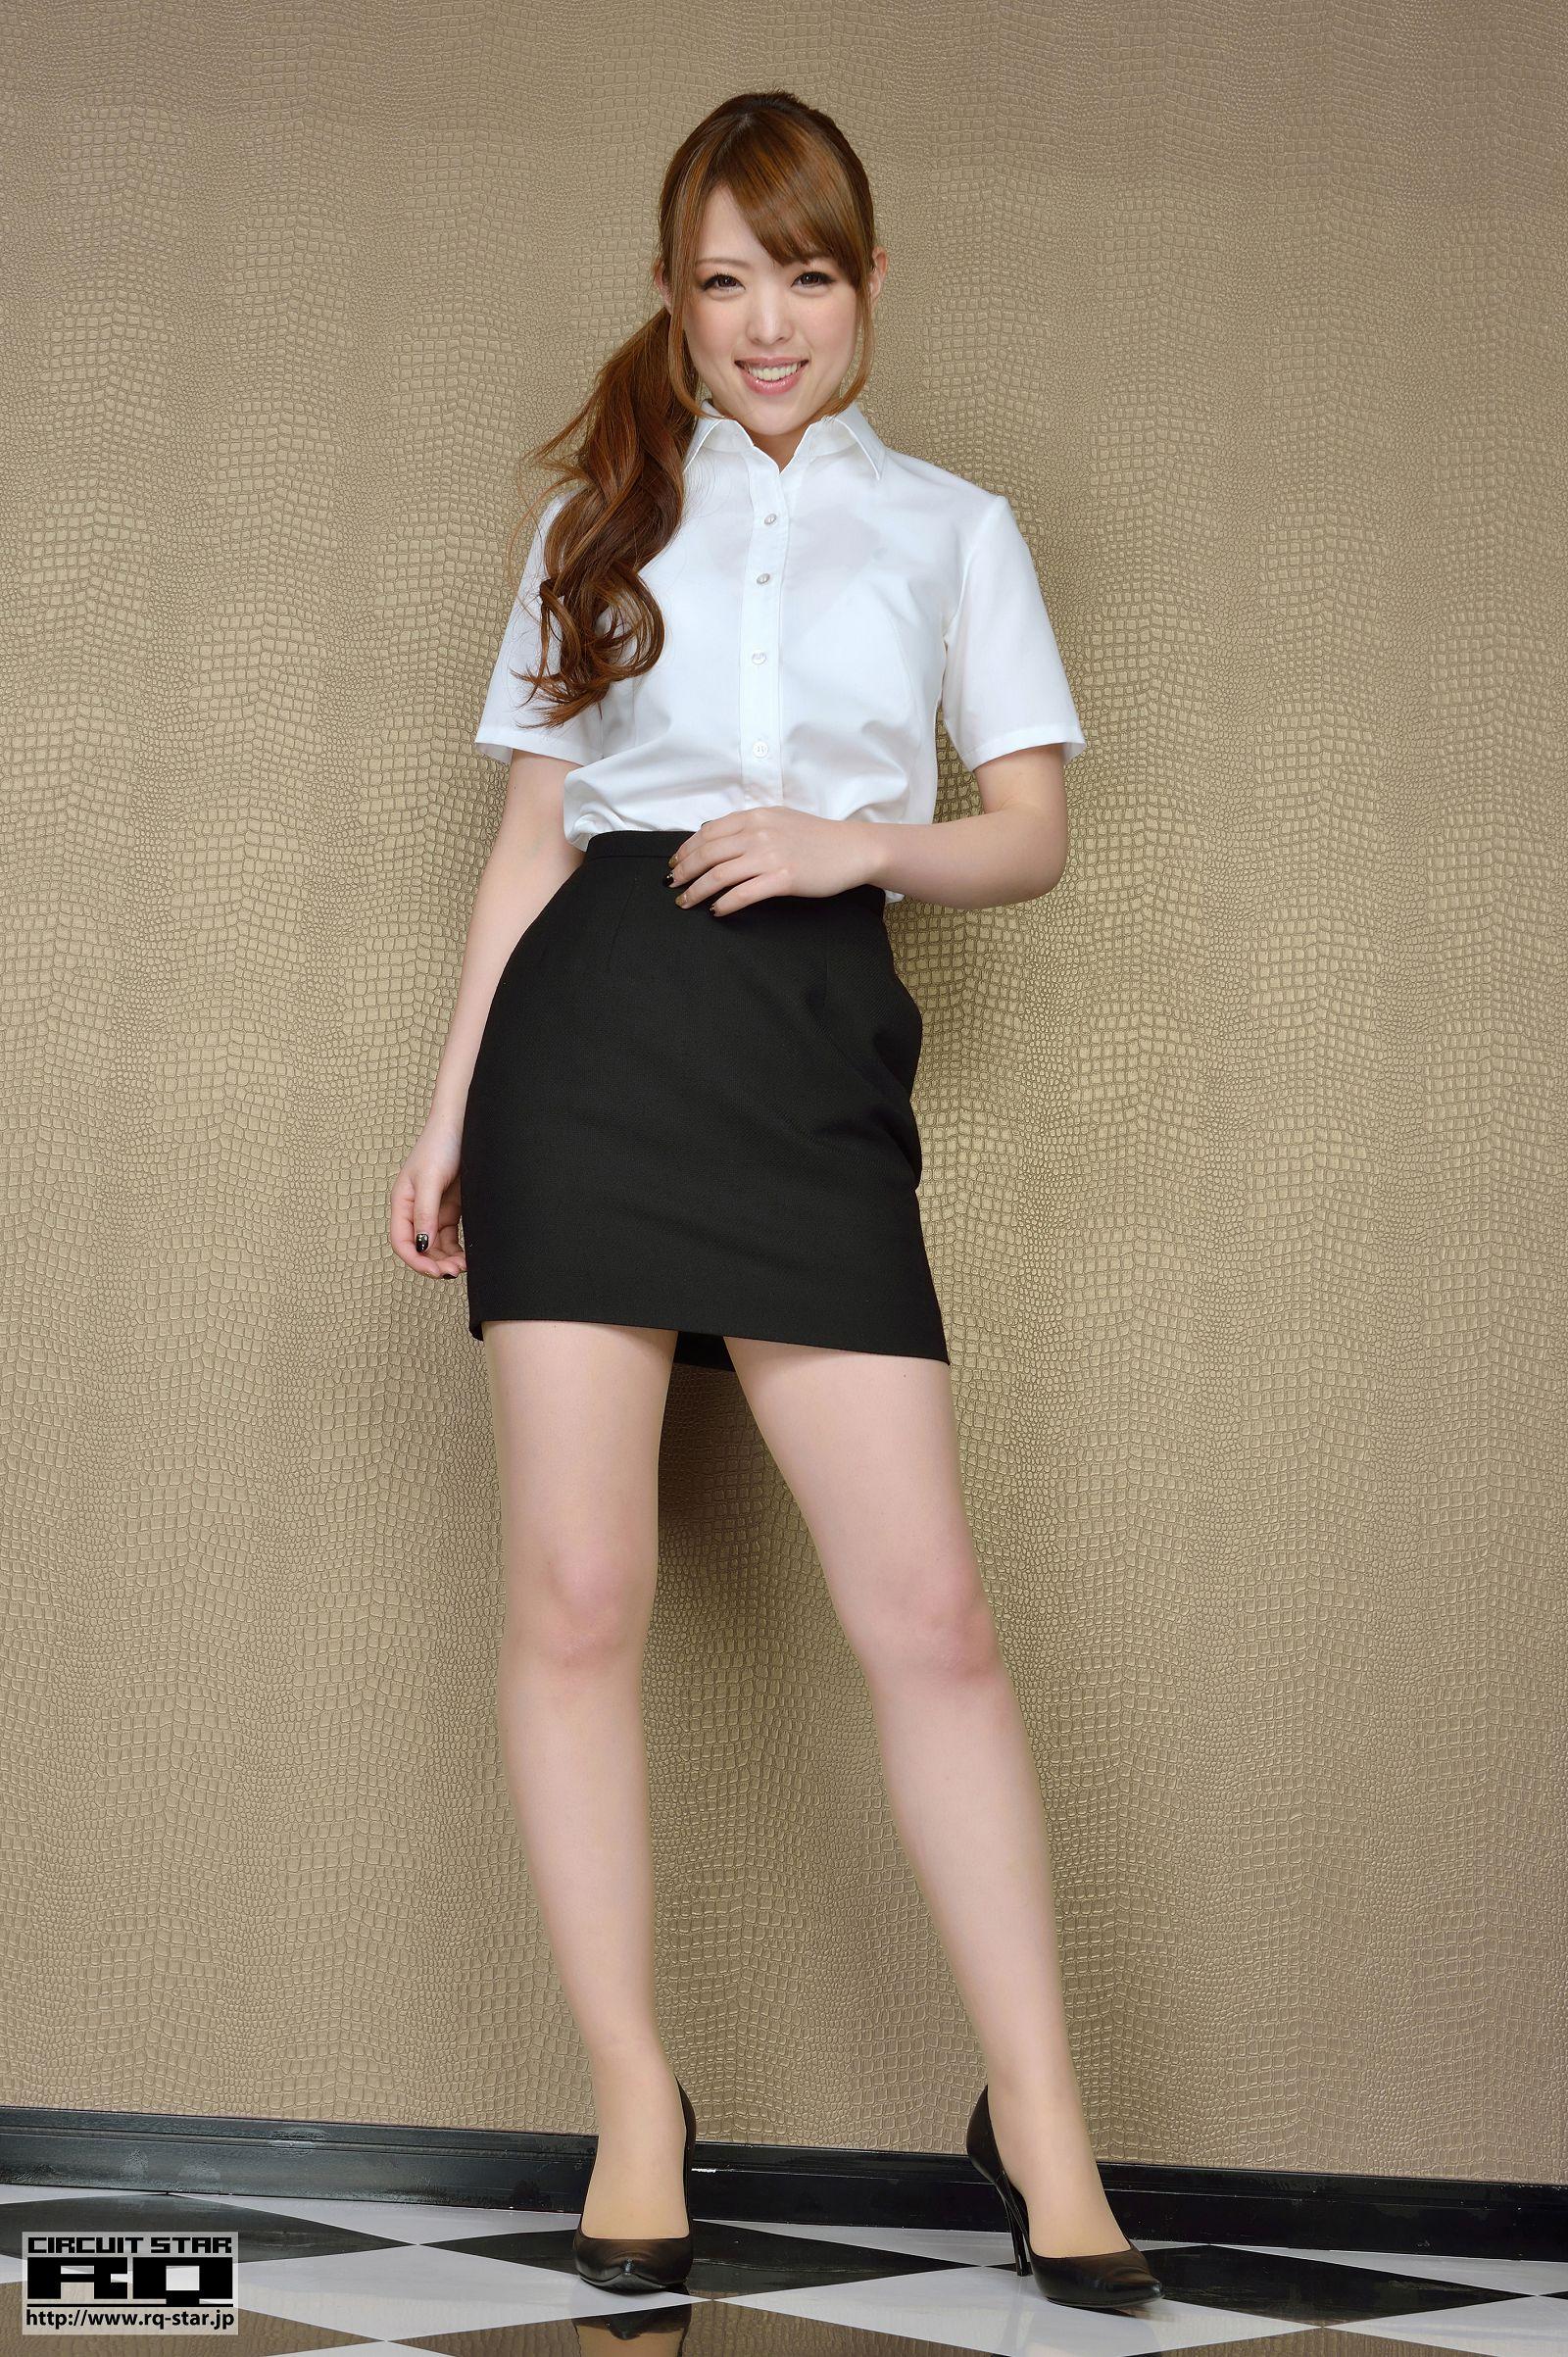 [RQ-STAR美女] NO.00790 Mai Onozeki 小野関舞 Office Lady0